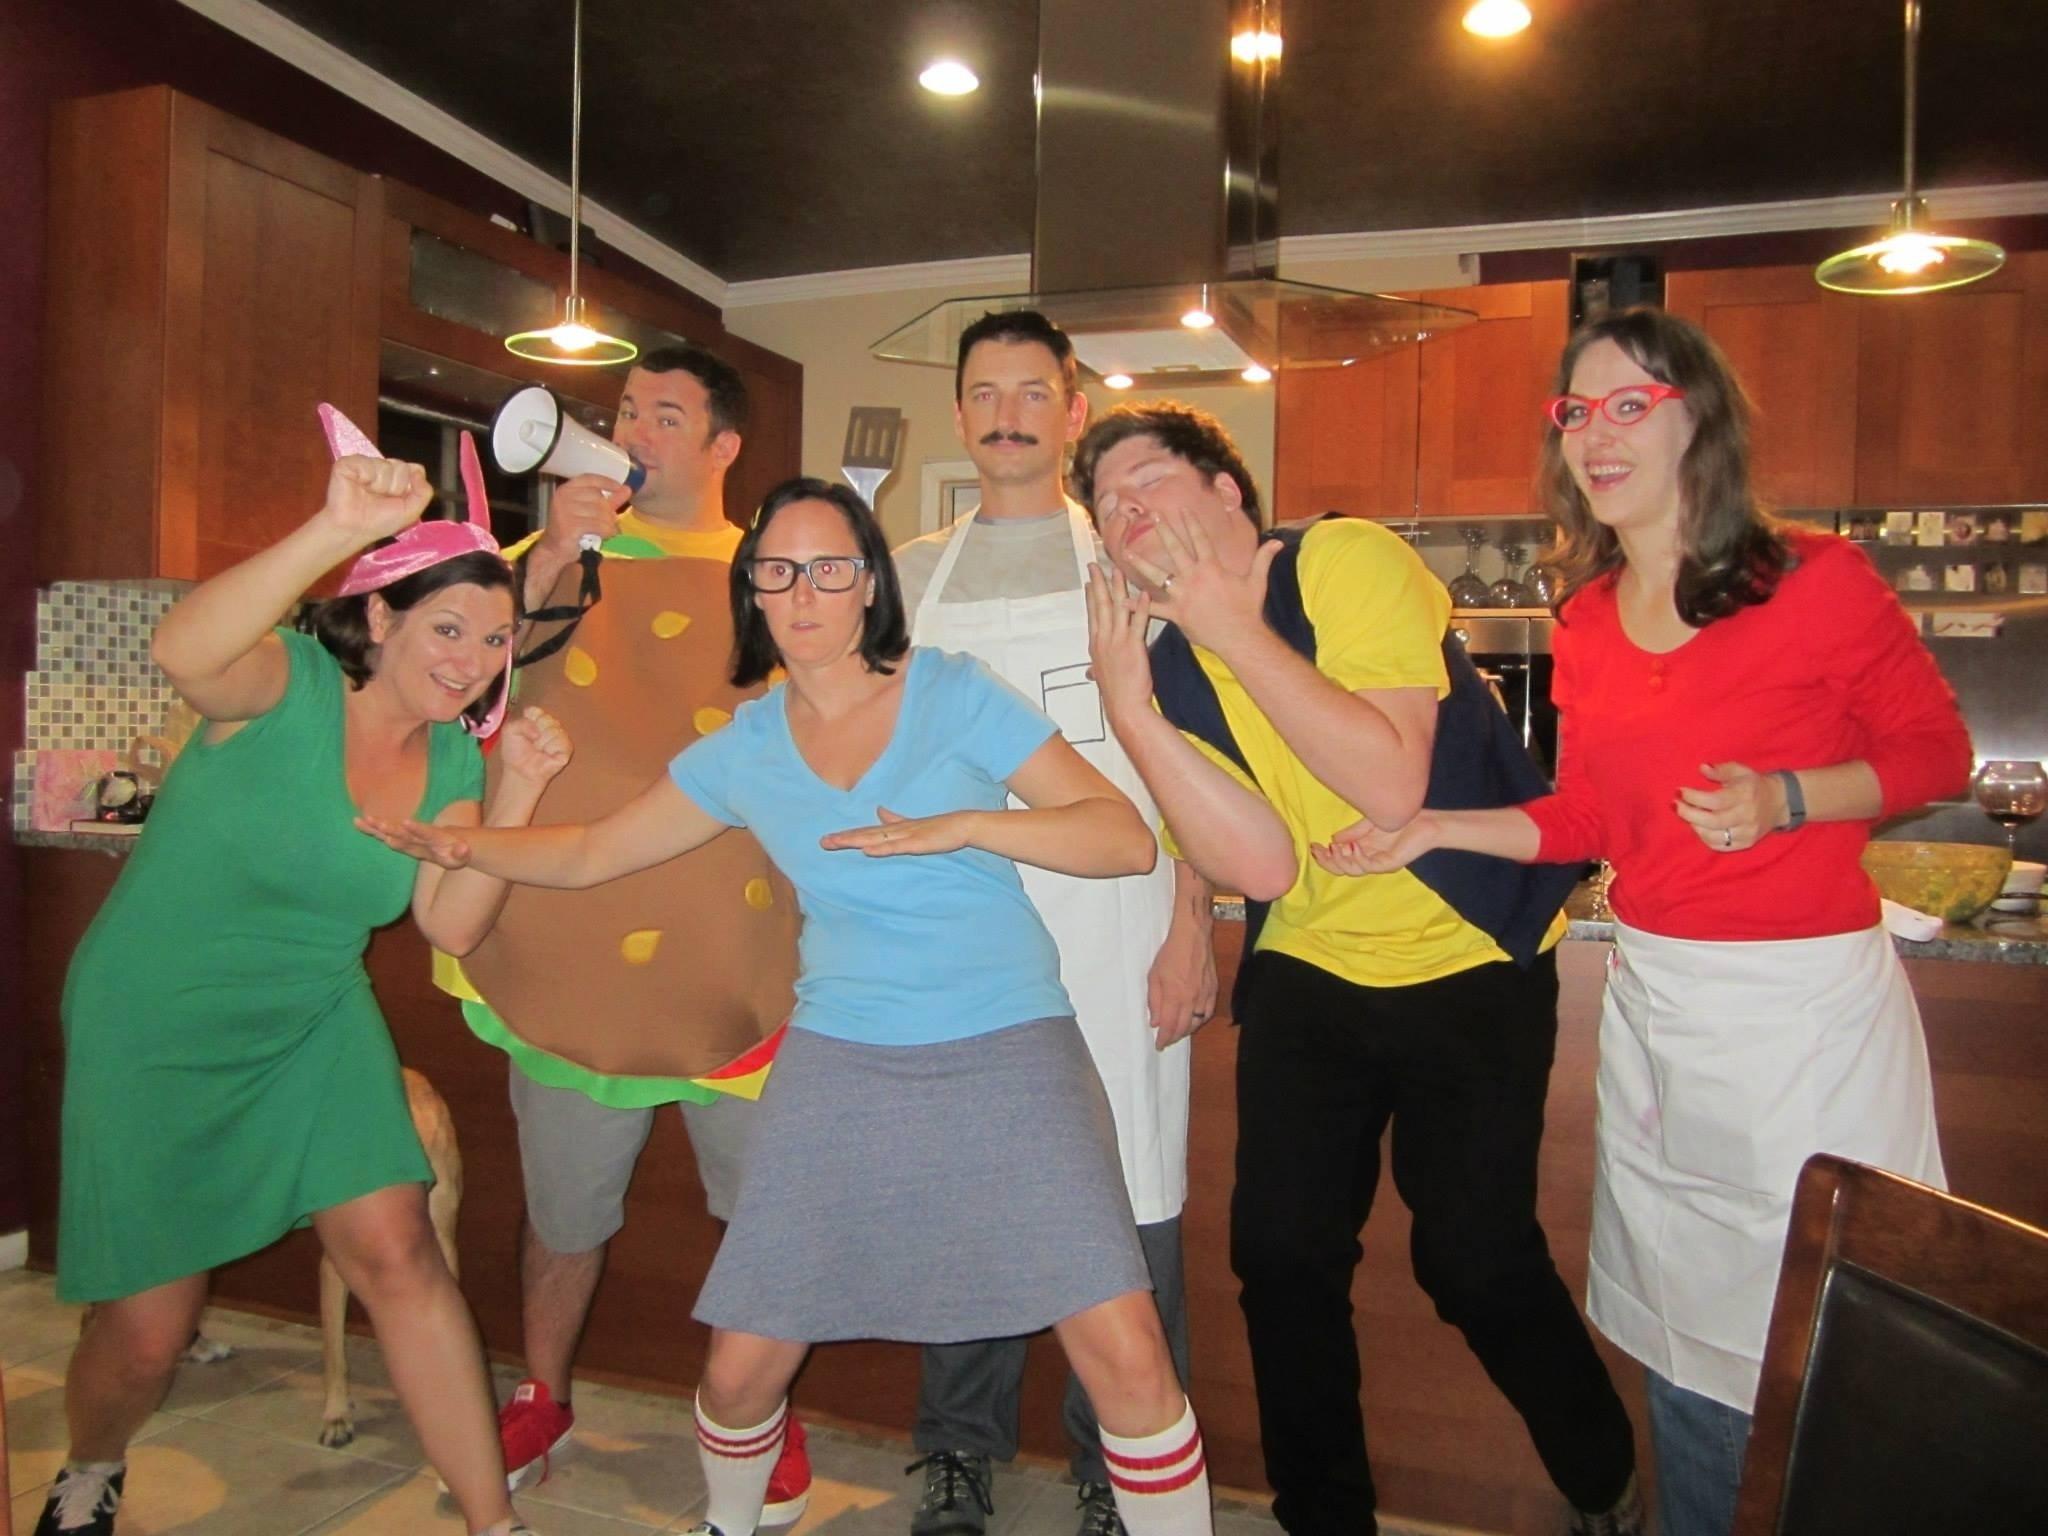 10 Cute Funny Group Halloween Costume Ideas 35 fun group halloween costumes for you and your friends group 2021